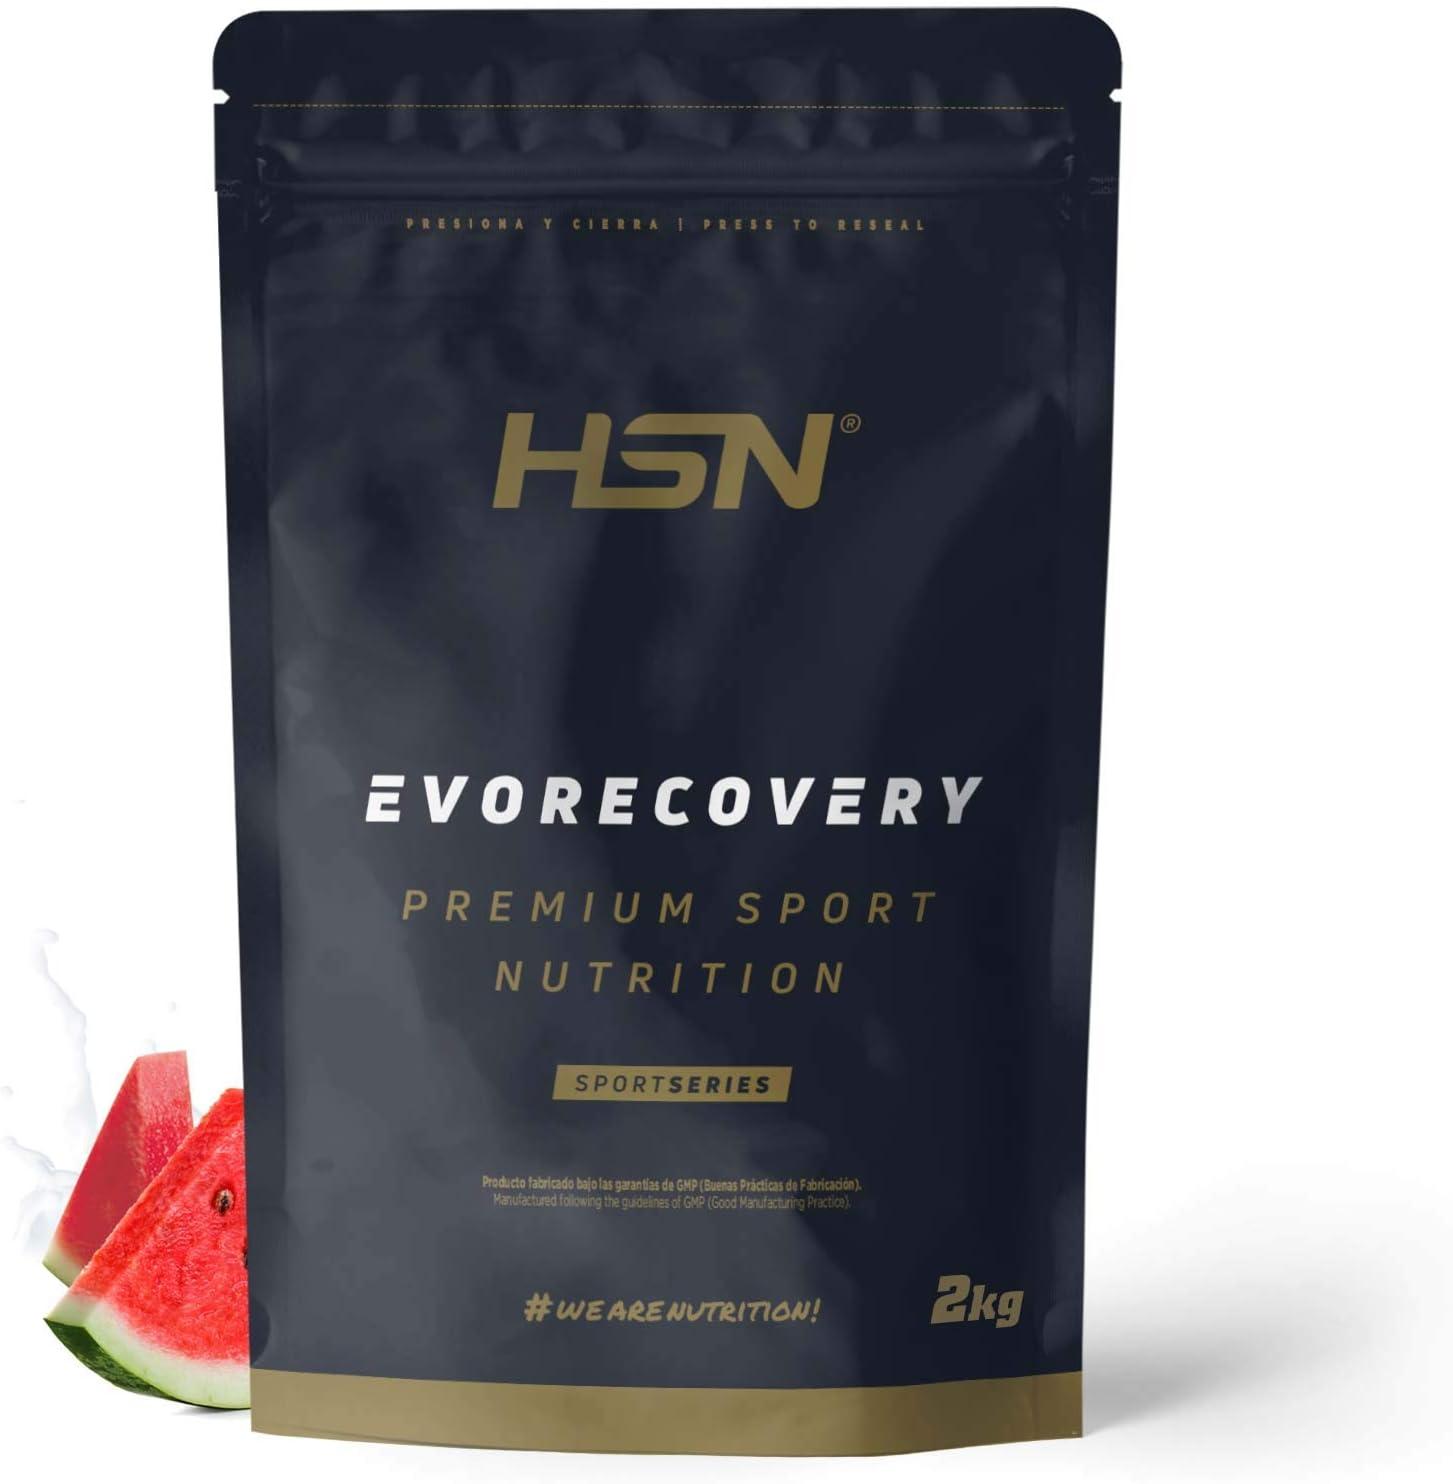 Recuperador Muscular Evorecovery de HSN | Todo en Uno ...